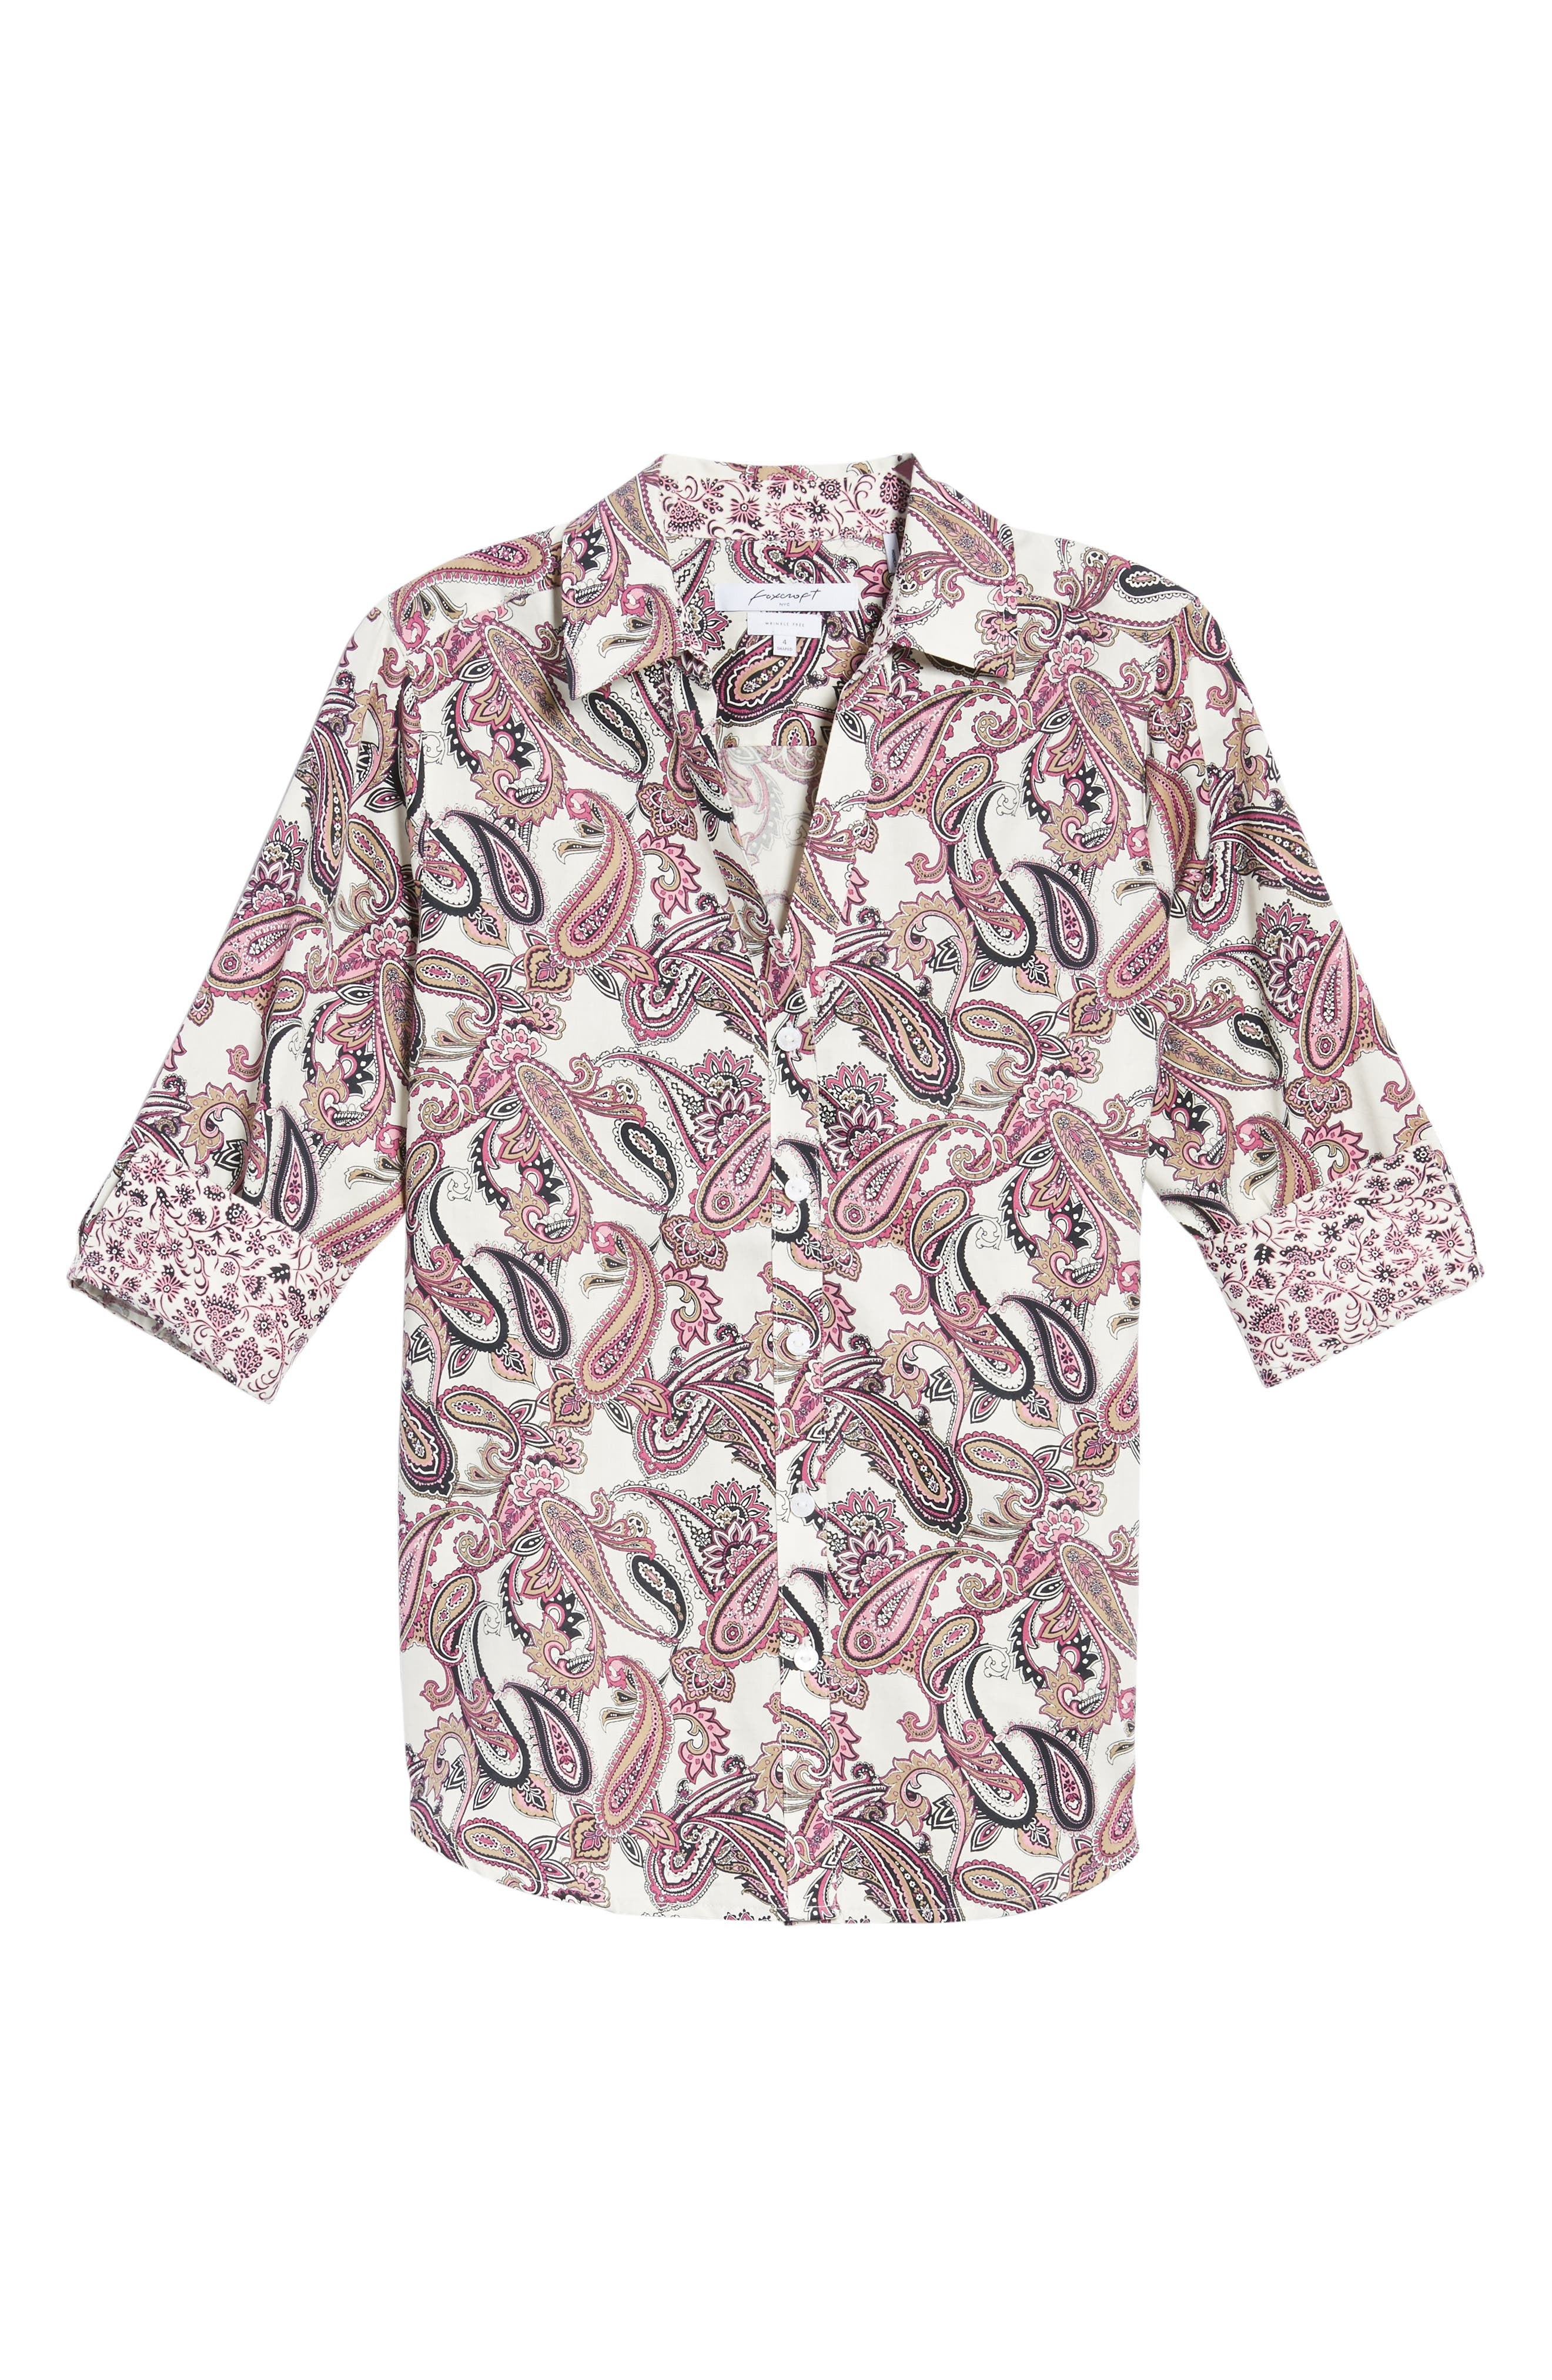 Mary Paisley Wrinkle Free Shirt,                             Alternate thumbnail 6, color,                             935